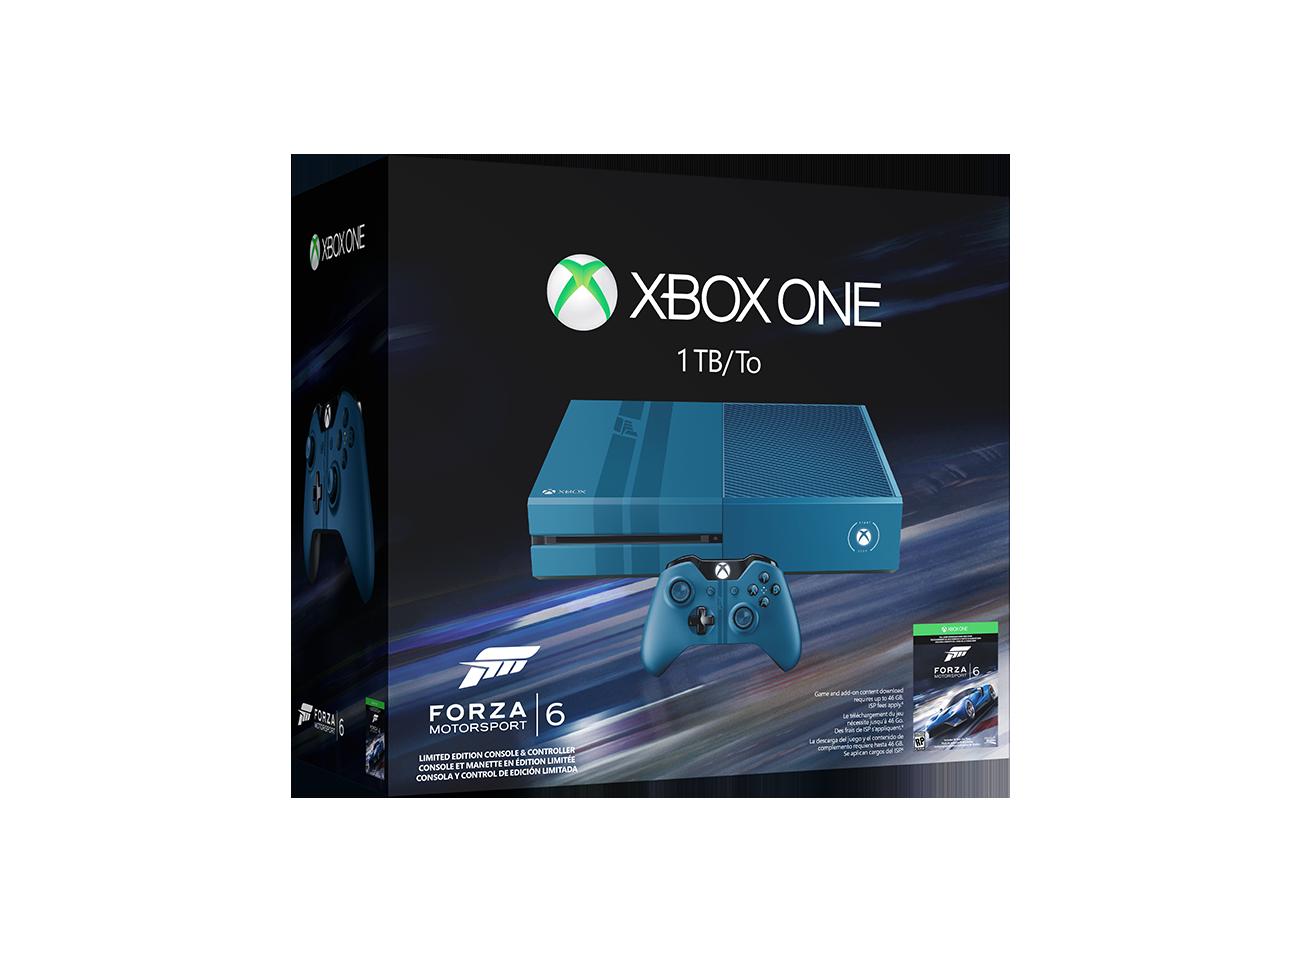 XboxOne_1TBConsole_Forza6_US-CA_ANL_RGB.PNG